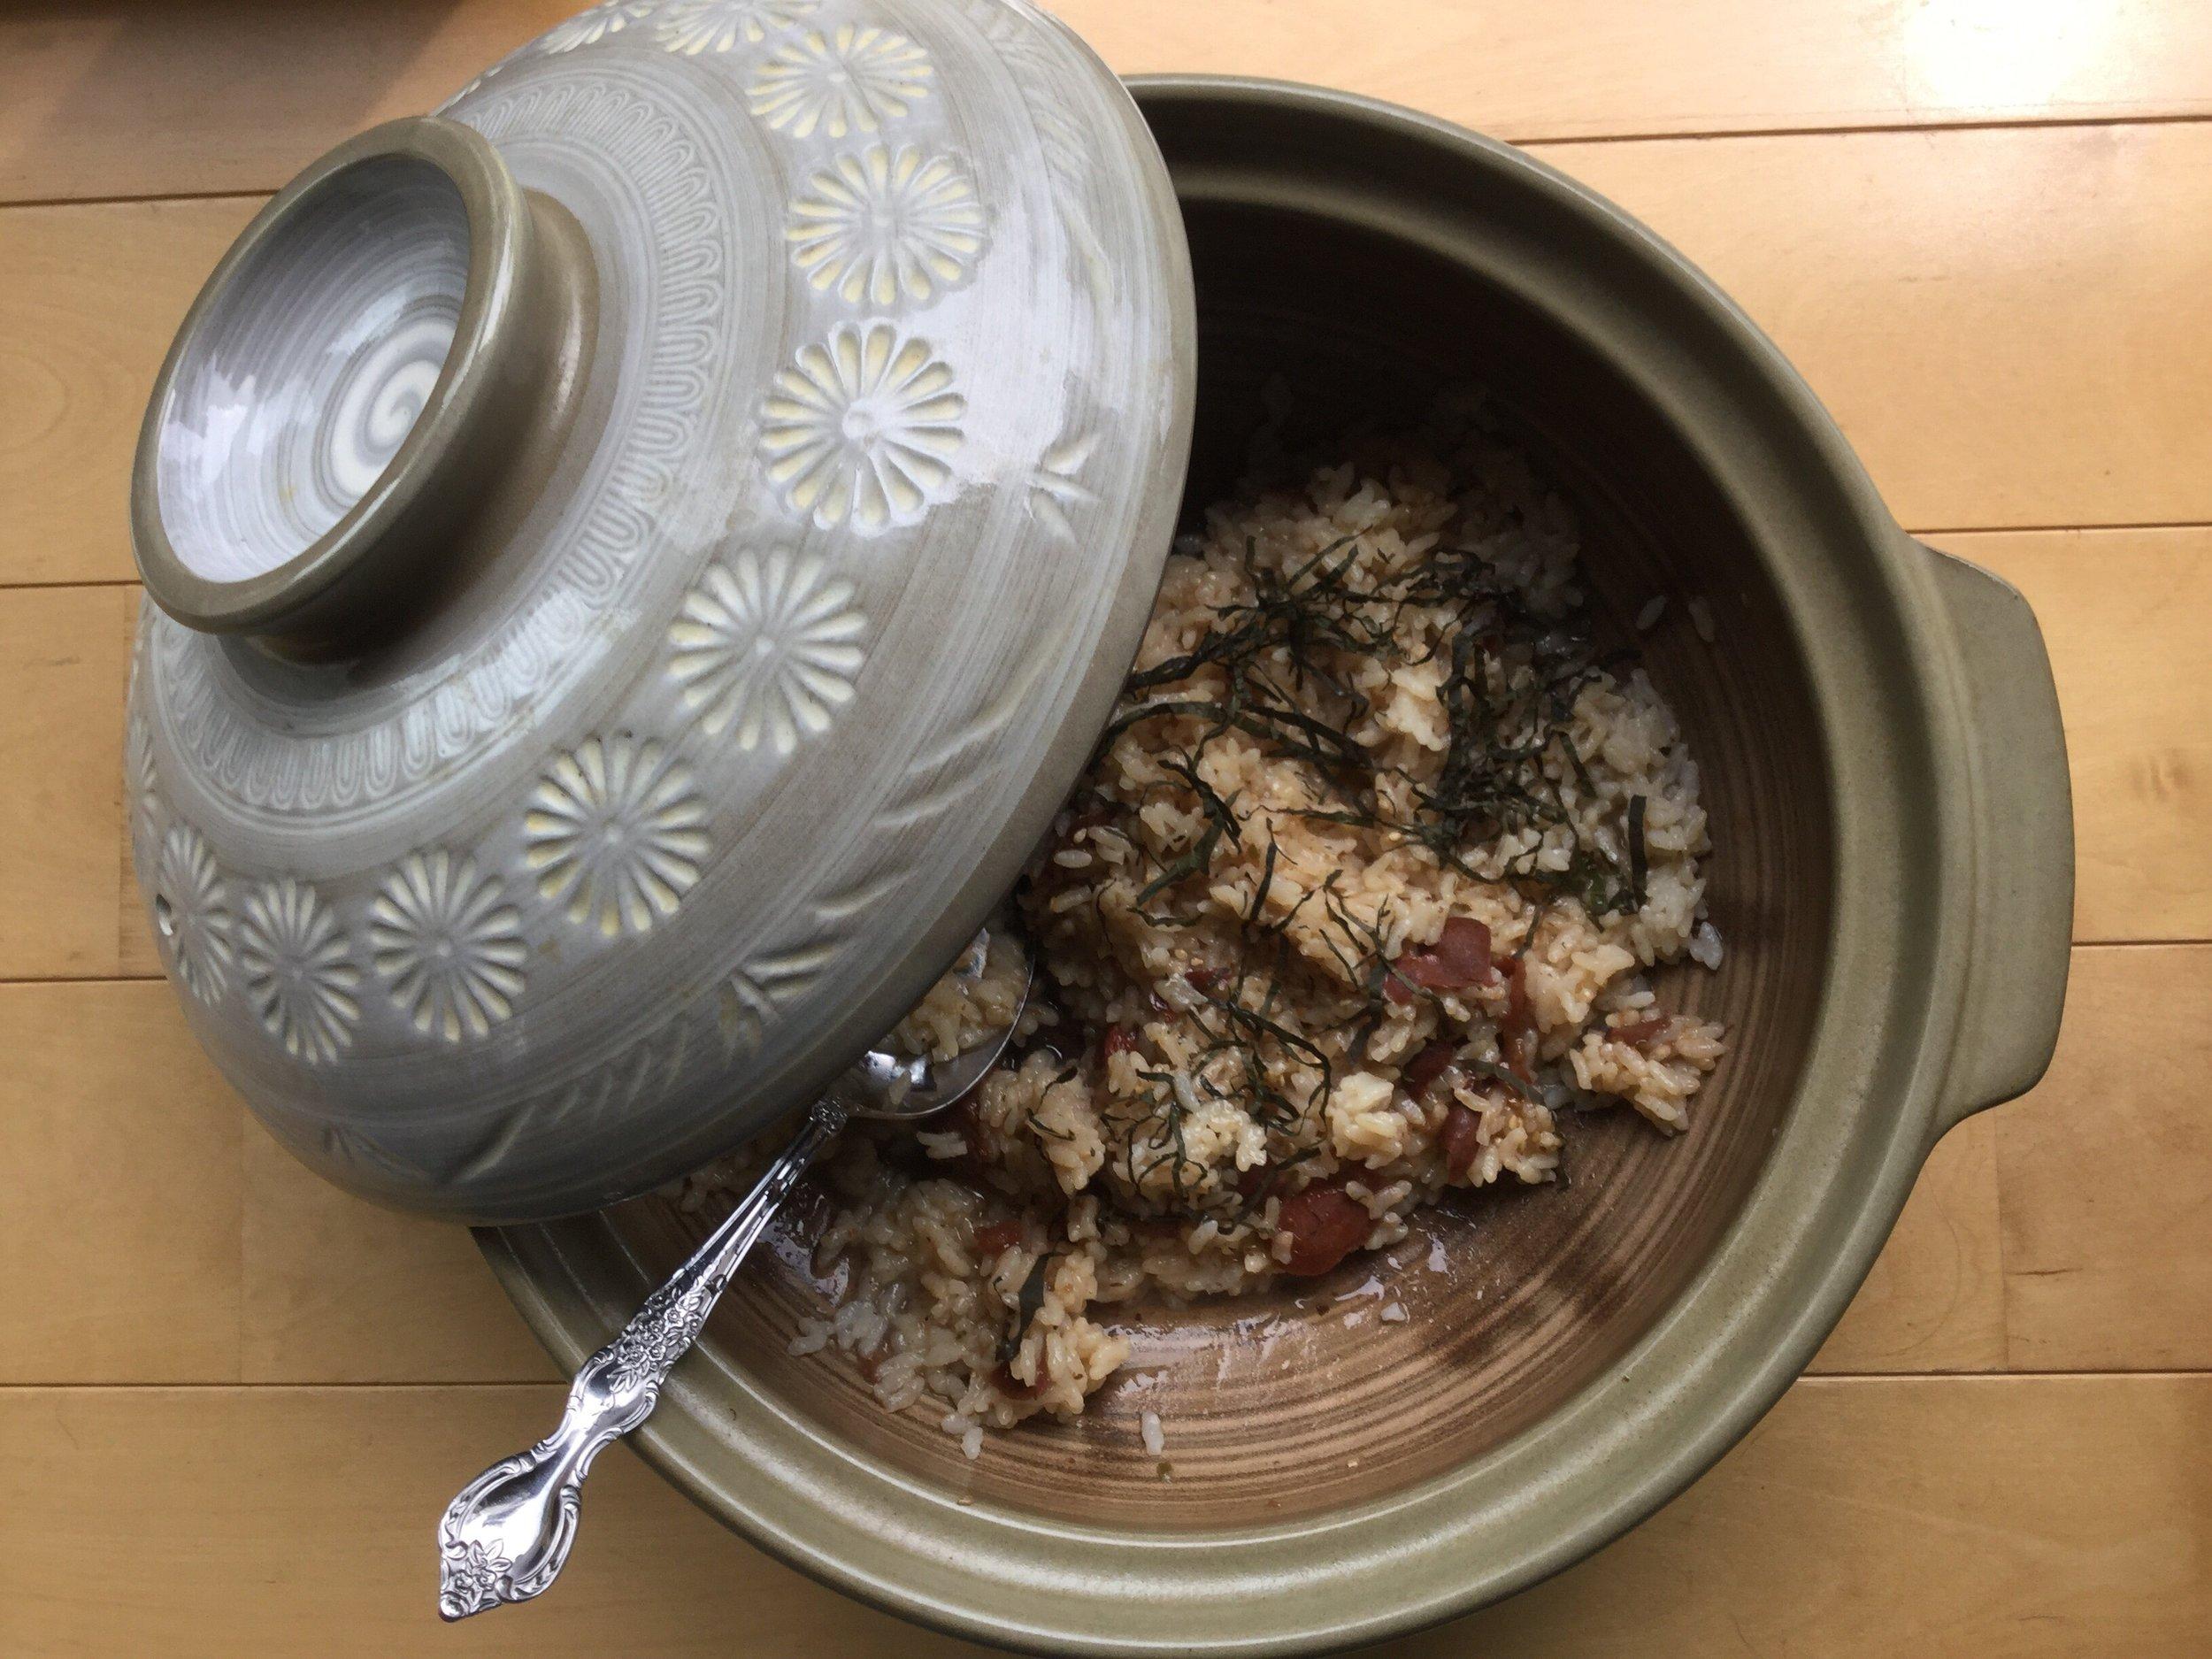 Healing rice - and I am feeling better already!